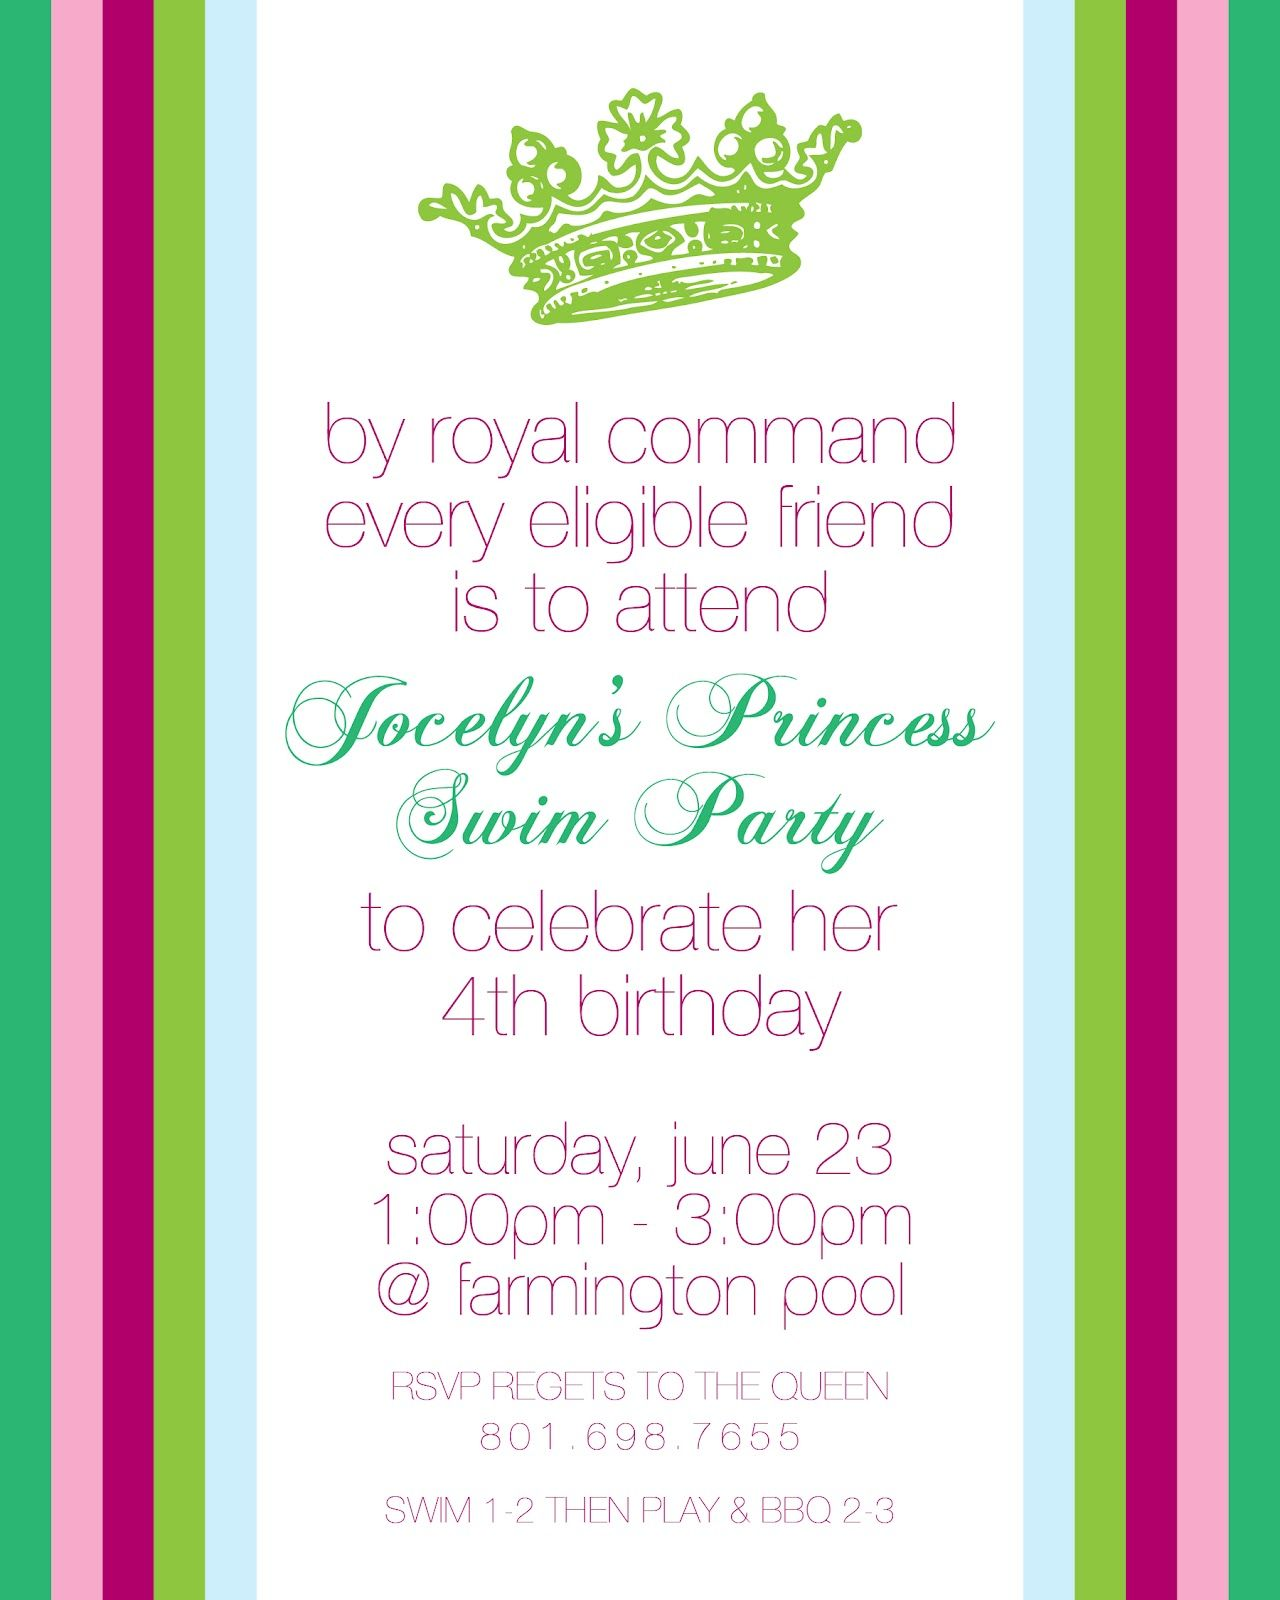 HiLLmark Design . princess birthday invitation | HiLLmark Design- my ...